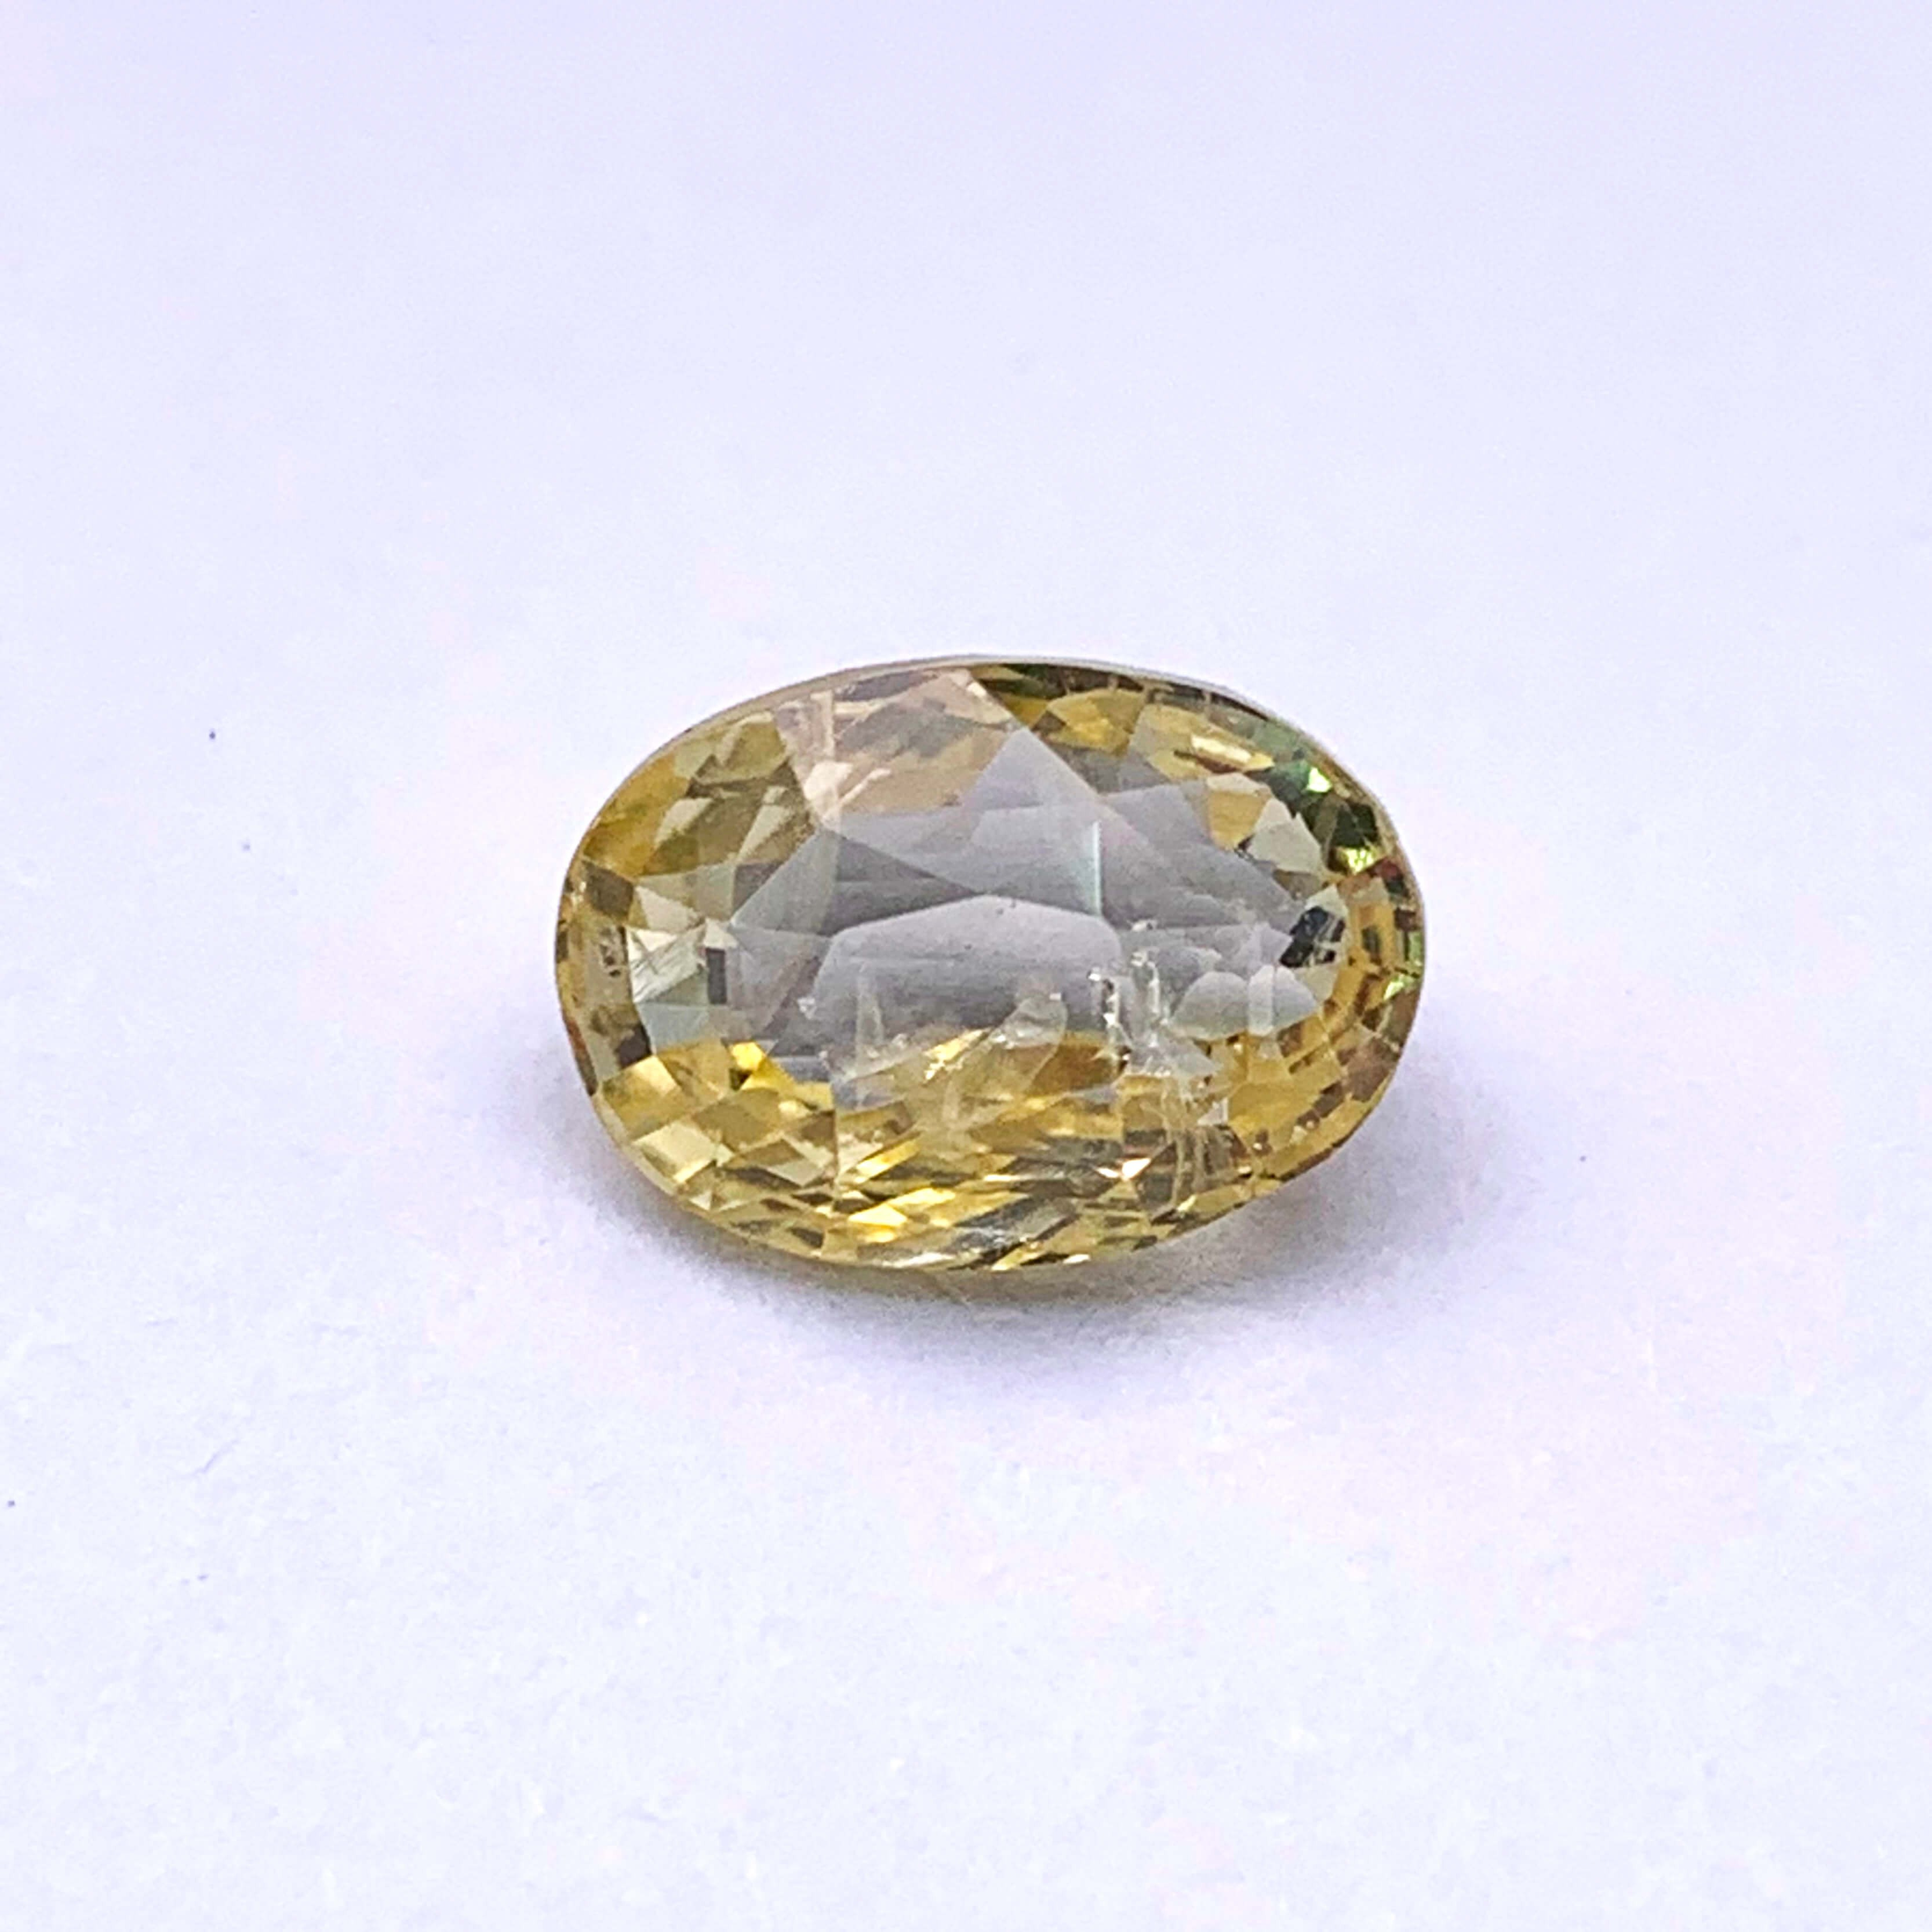 4.75 Carat/ 5.27 Ratti Natural Ceylon Yellow Sapphire Gemstone